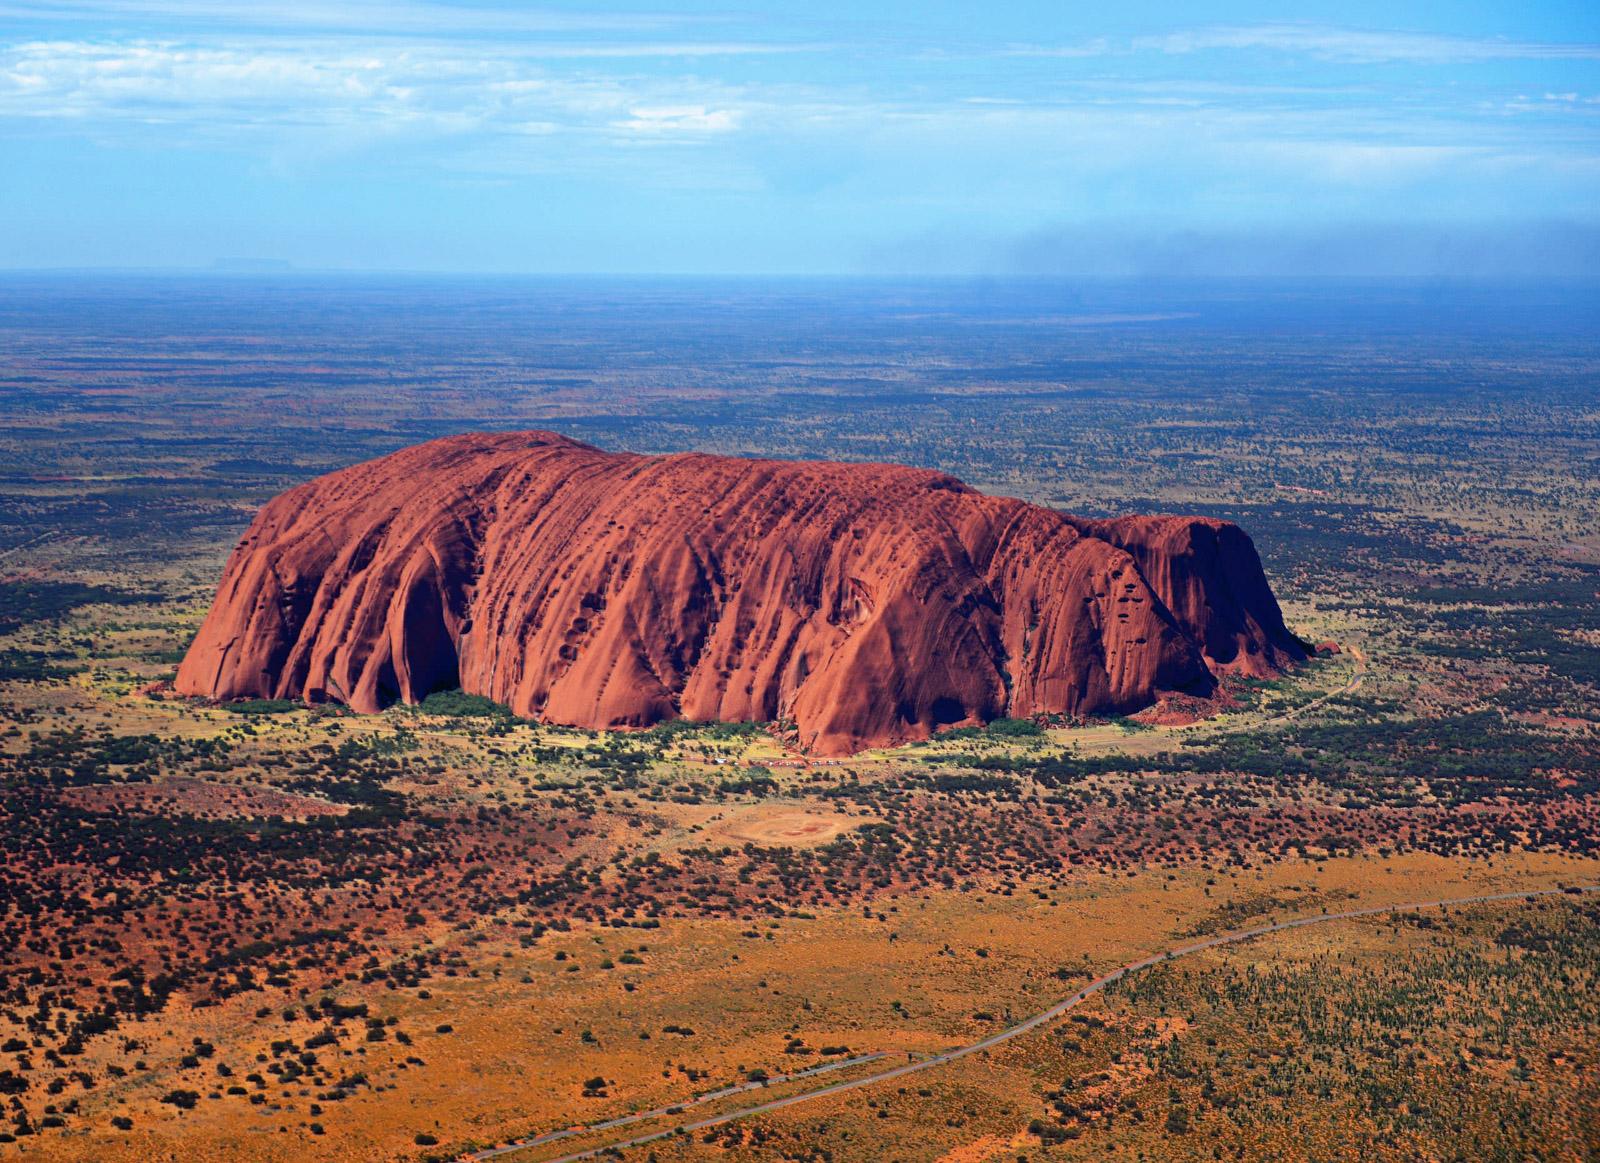 Uluru in the Australian desert